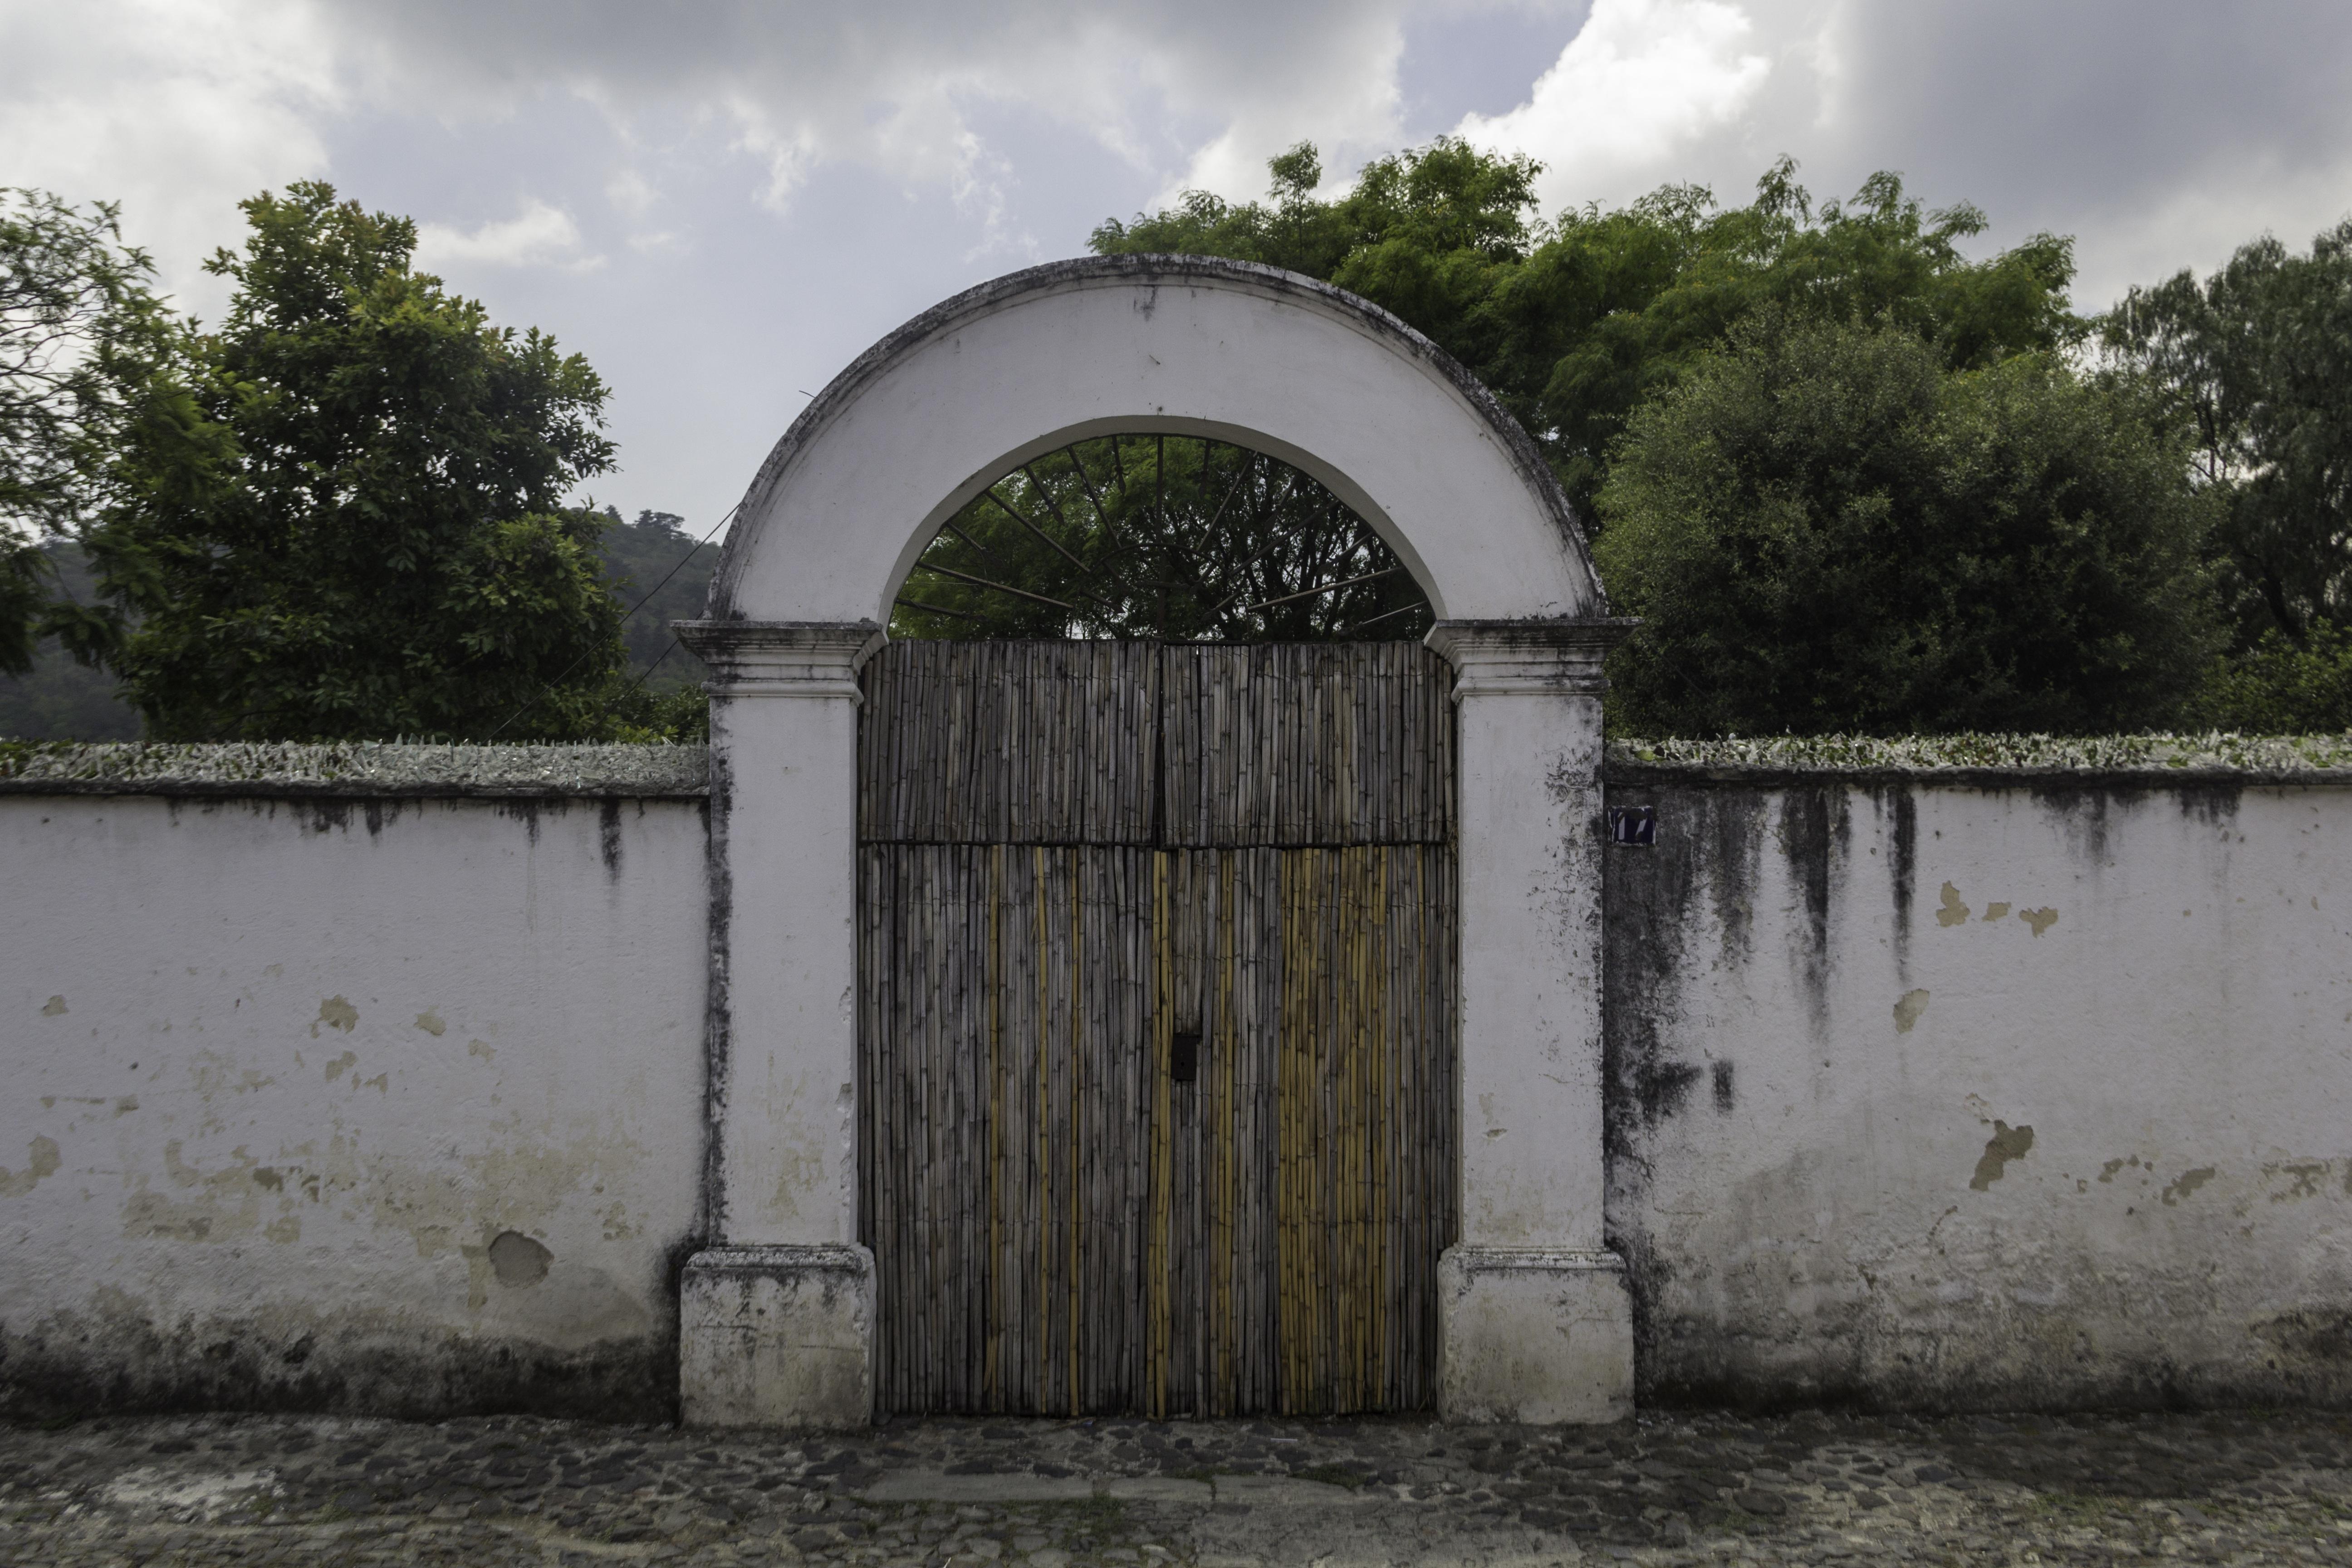 Arcos de ladrillo rustico cool best cheap download cuatro for Arcos de ladrillo rustico